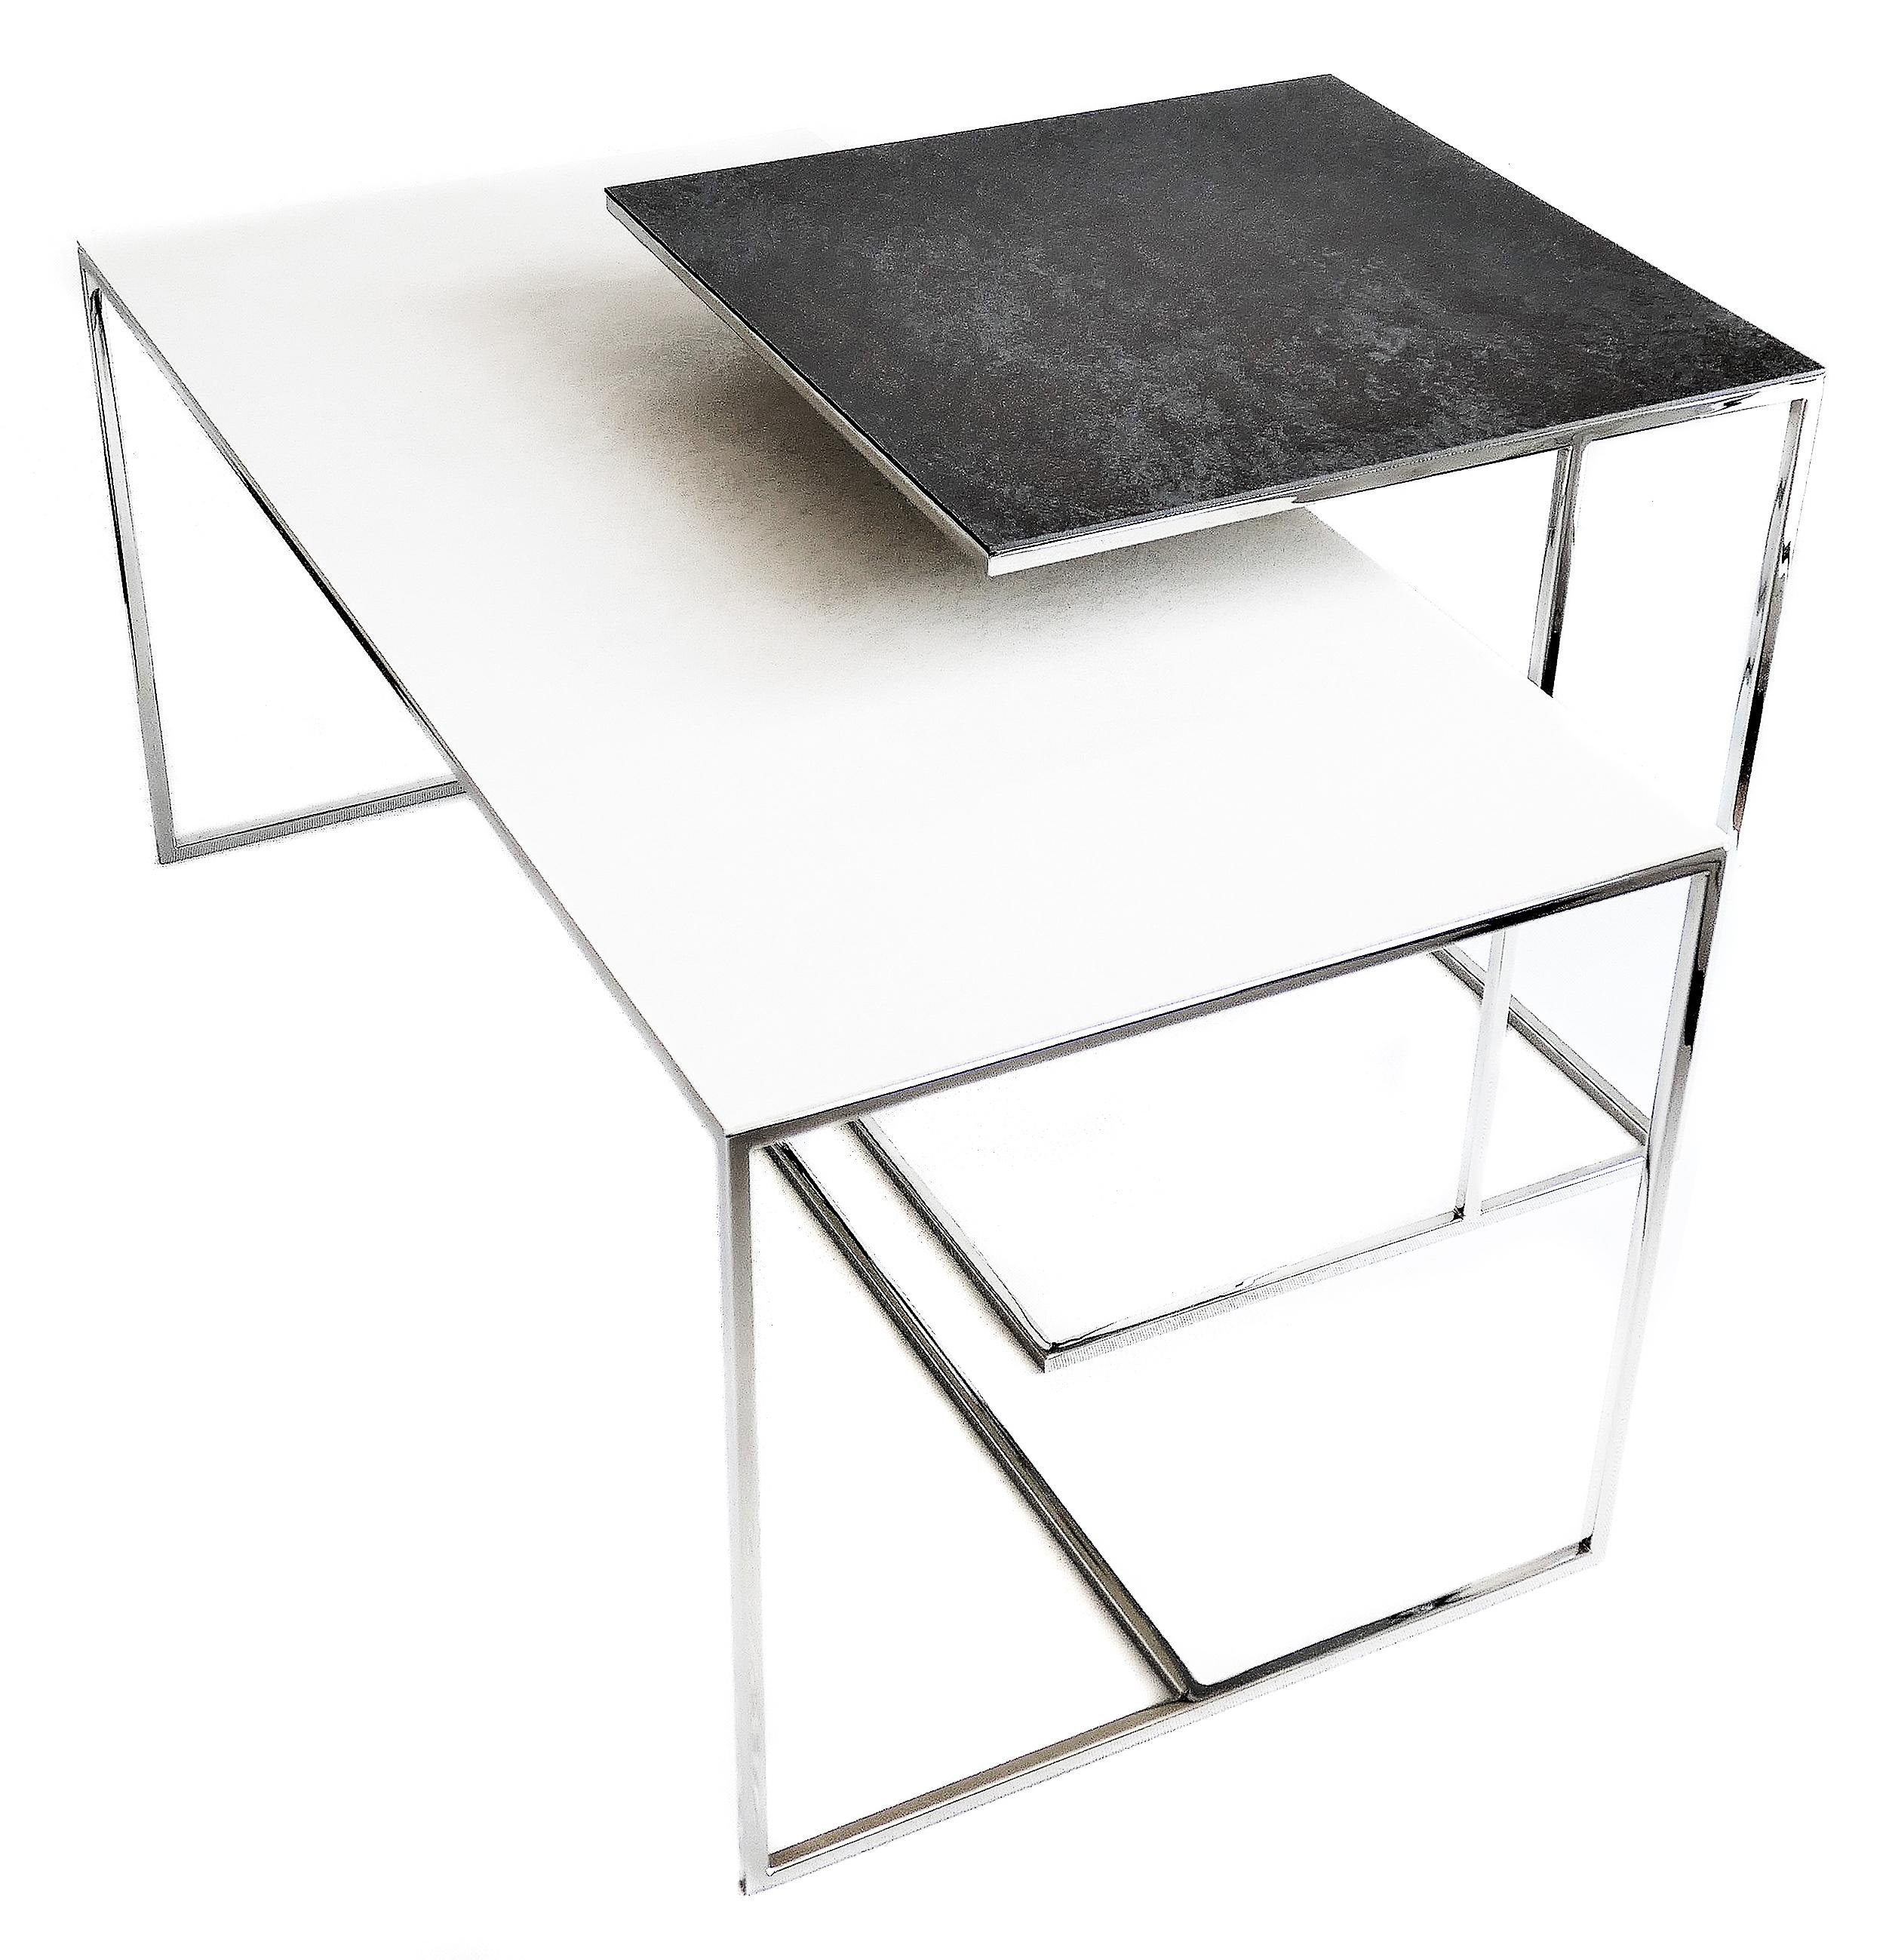 REA furniture LINOSA – rama CHROME/ blat Laminam OXIDE BIANCO – wymiary 50/50/53 + VULCANO – rama CHROME/ blat Laminam OXIDE NERO – wymiary 100/50/45